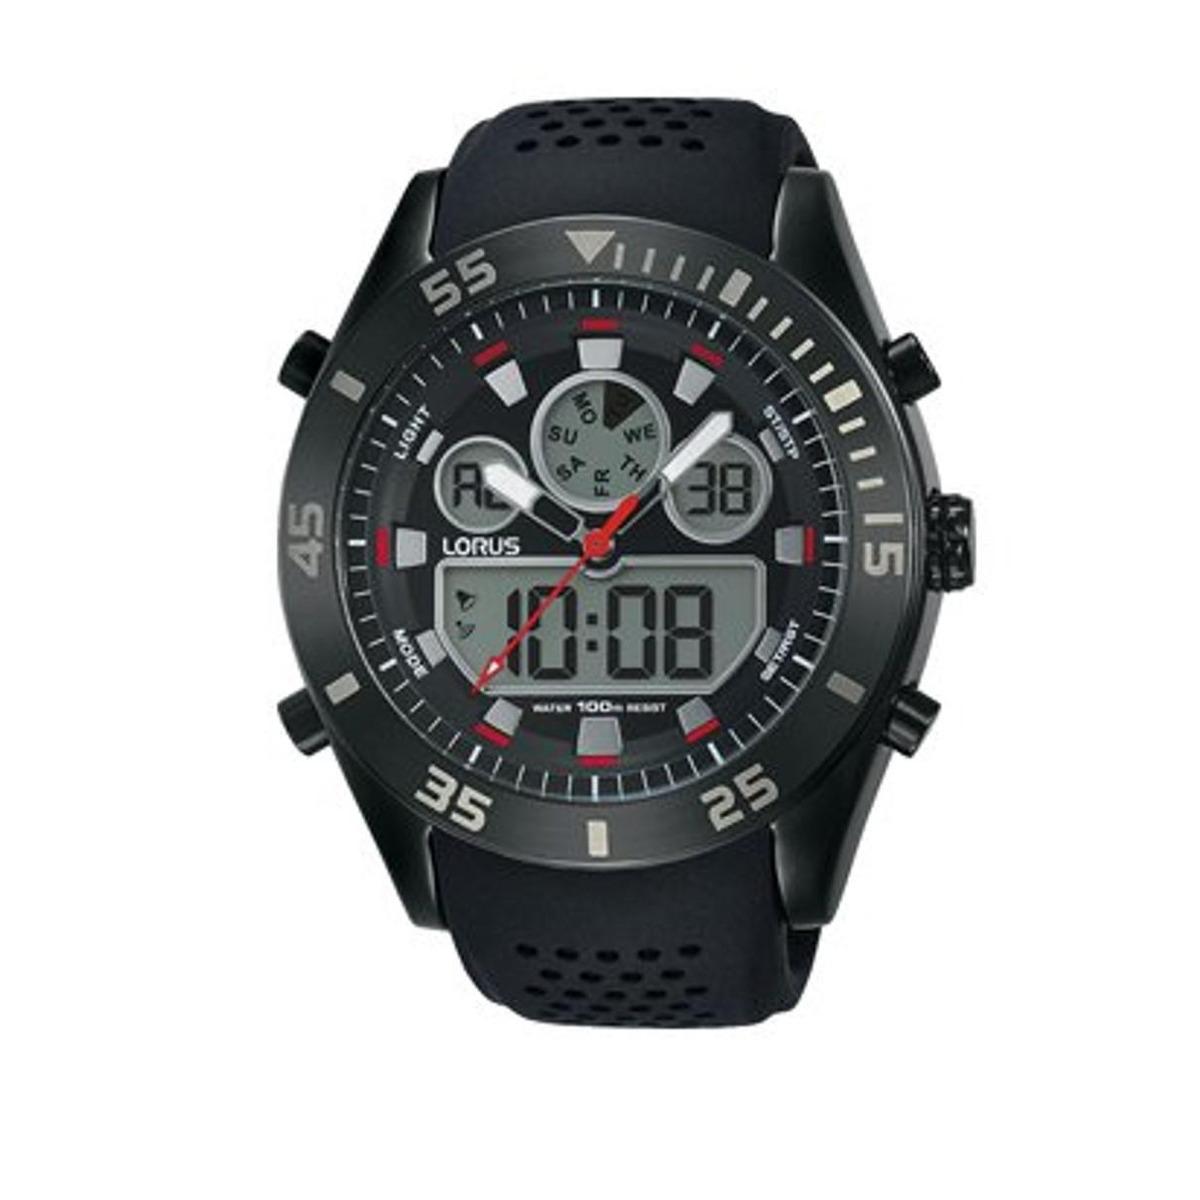 11f5fcddea7f reloj lorus cuarzo caballero r2335lx9. Cargando zoom.